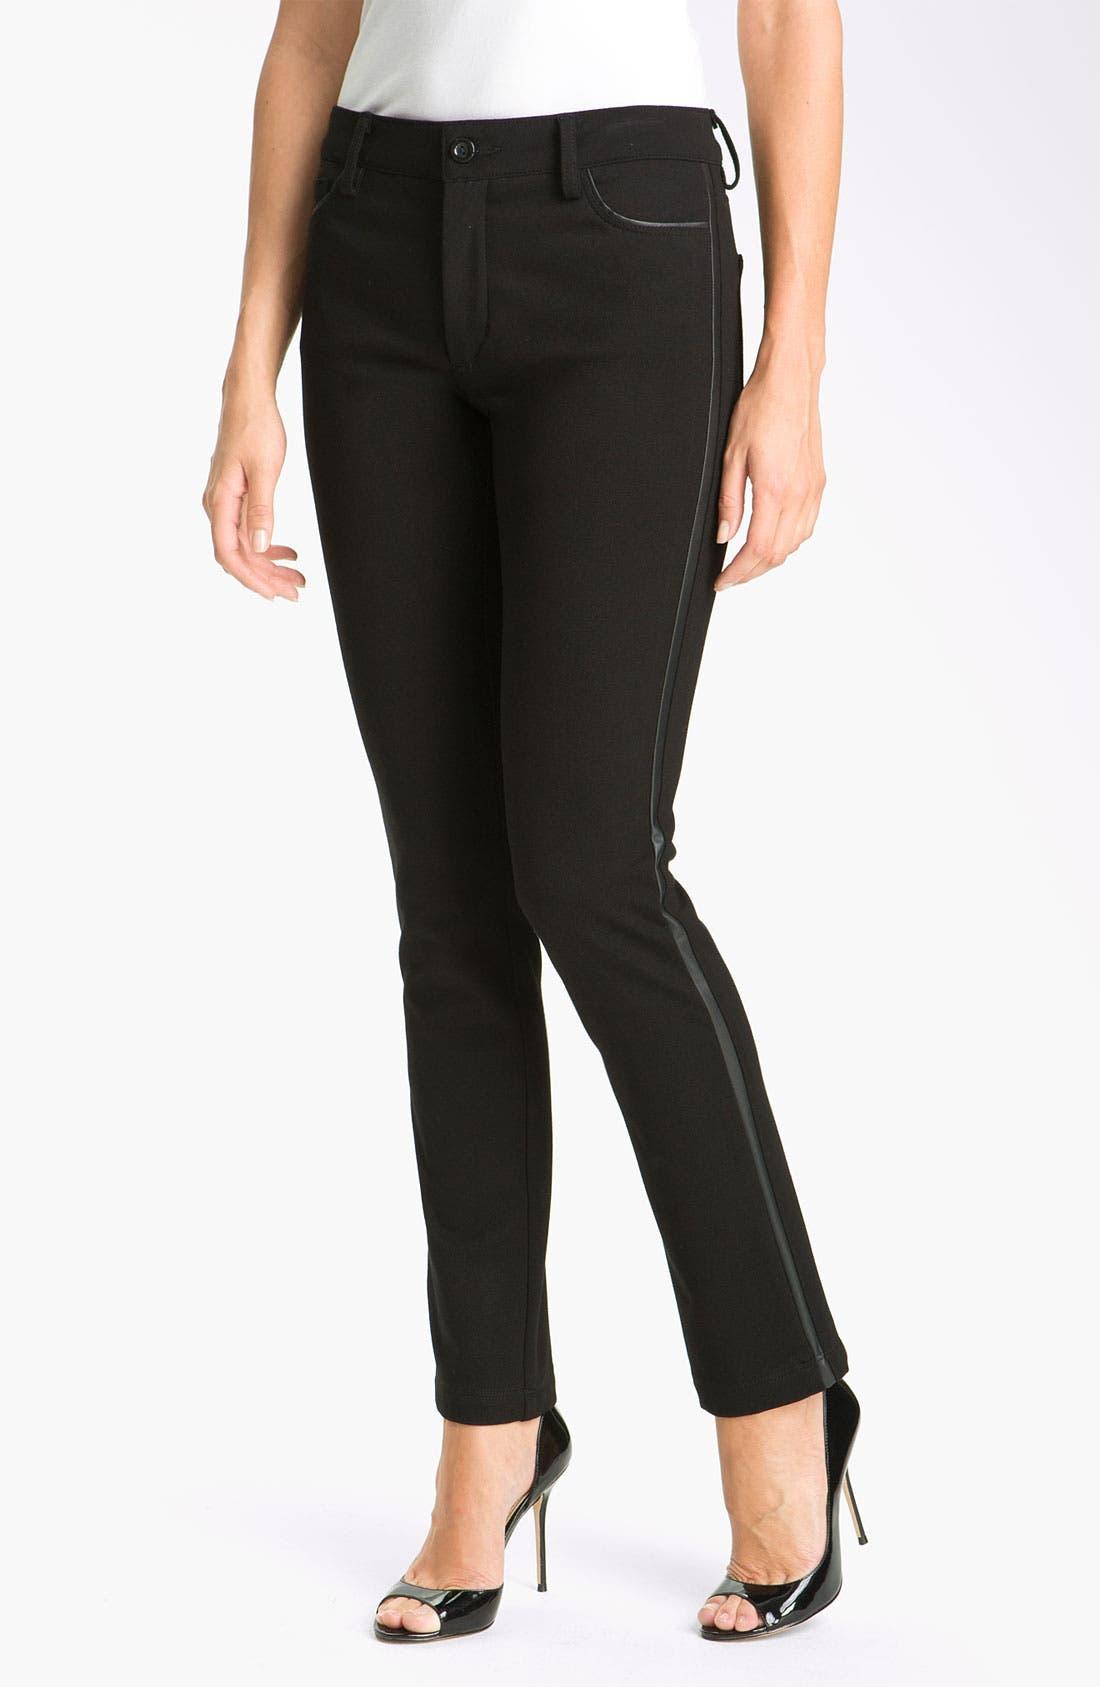 Alternate Image 1 Selected - NYDJ 'Pamela' Skinny Stretch Ponte Pants (Petite)